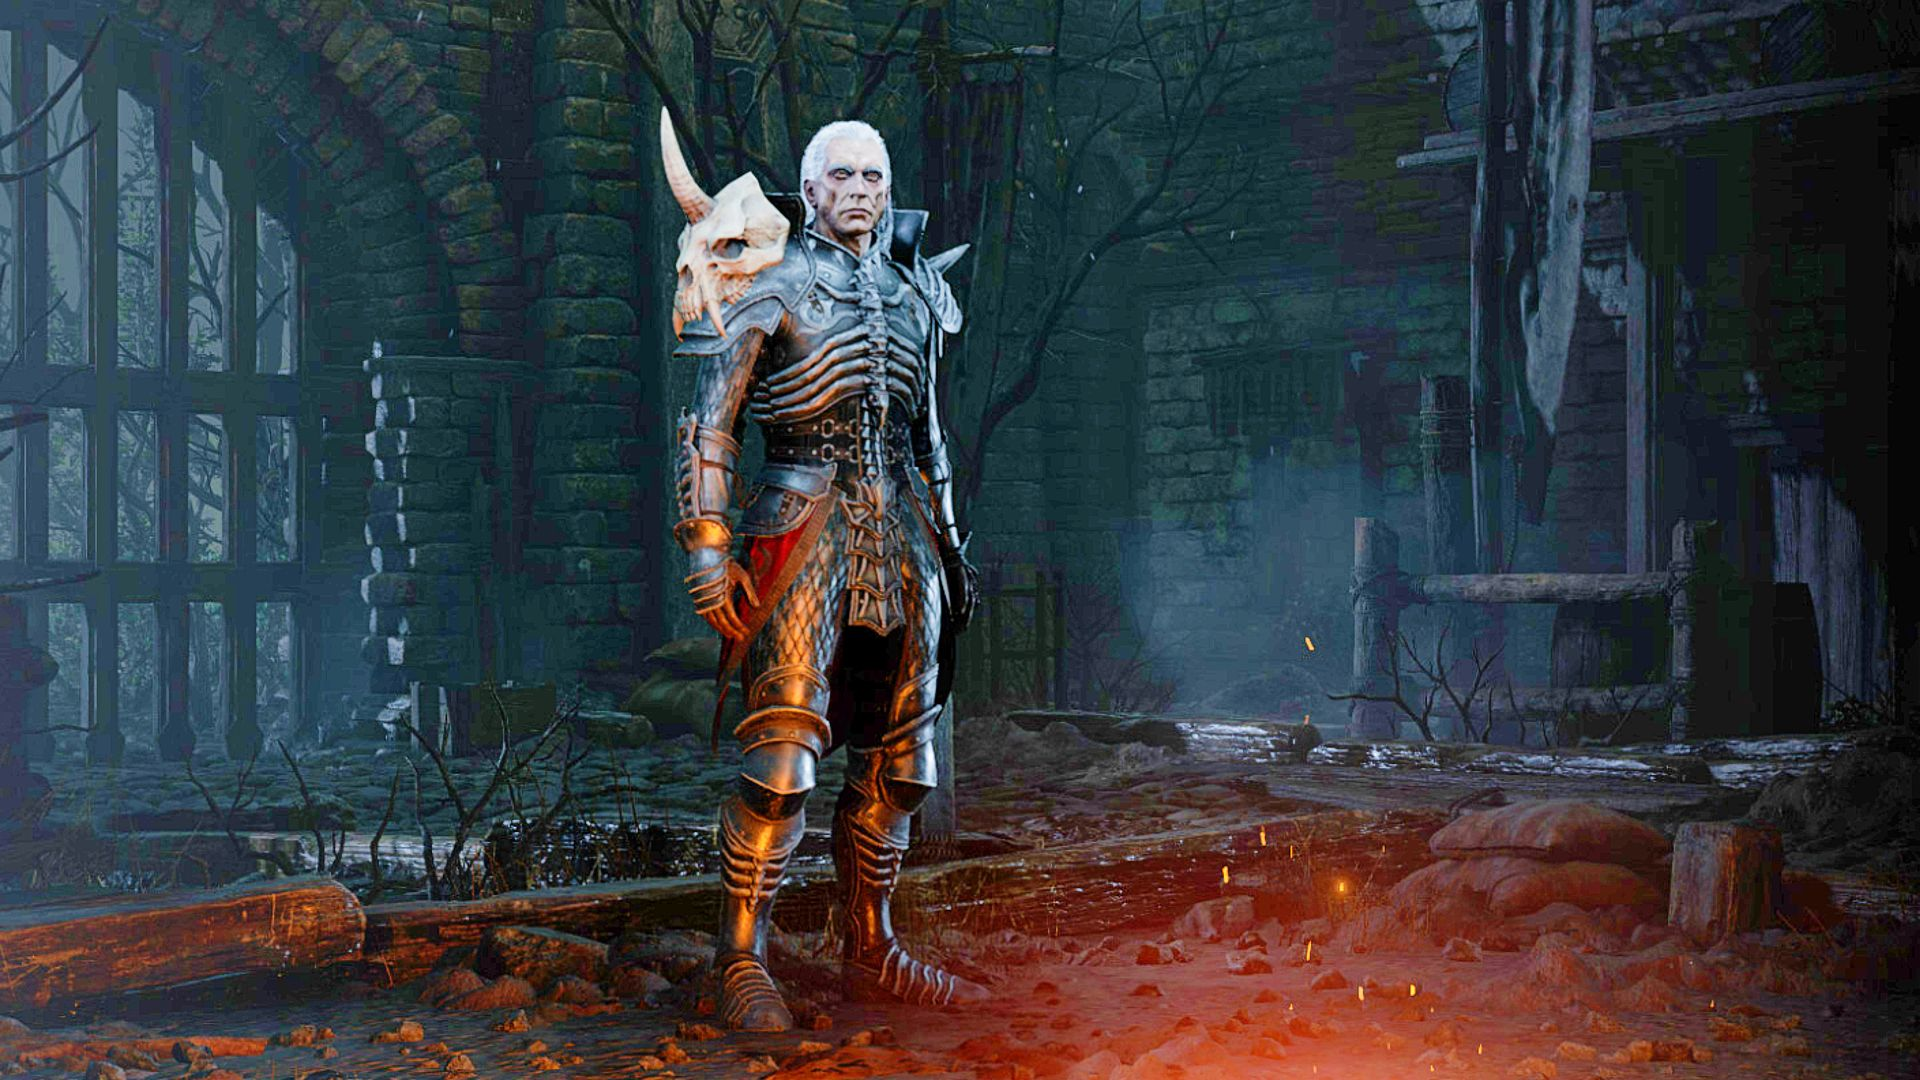 Diablo II: Resurrected Necromancer Fishymancer Build Guide - Sirus Gaming